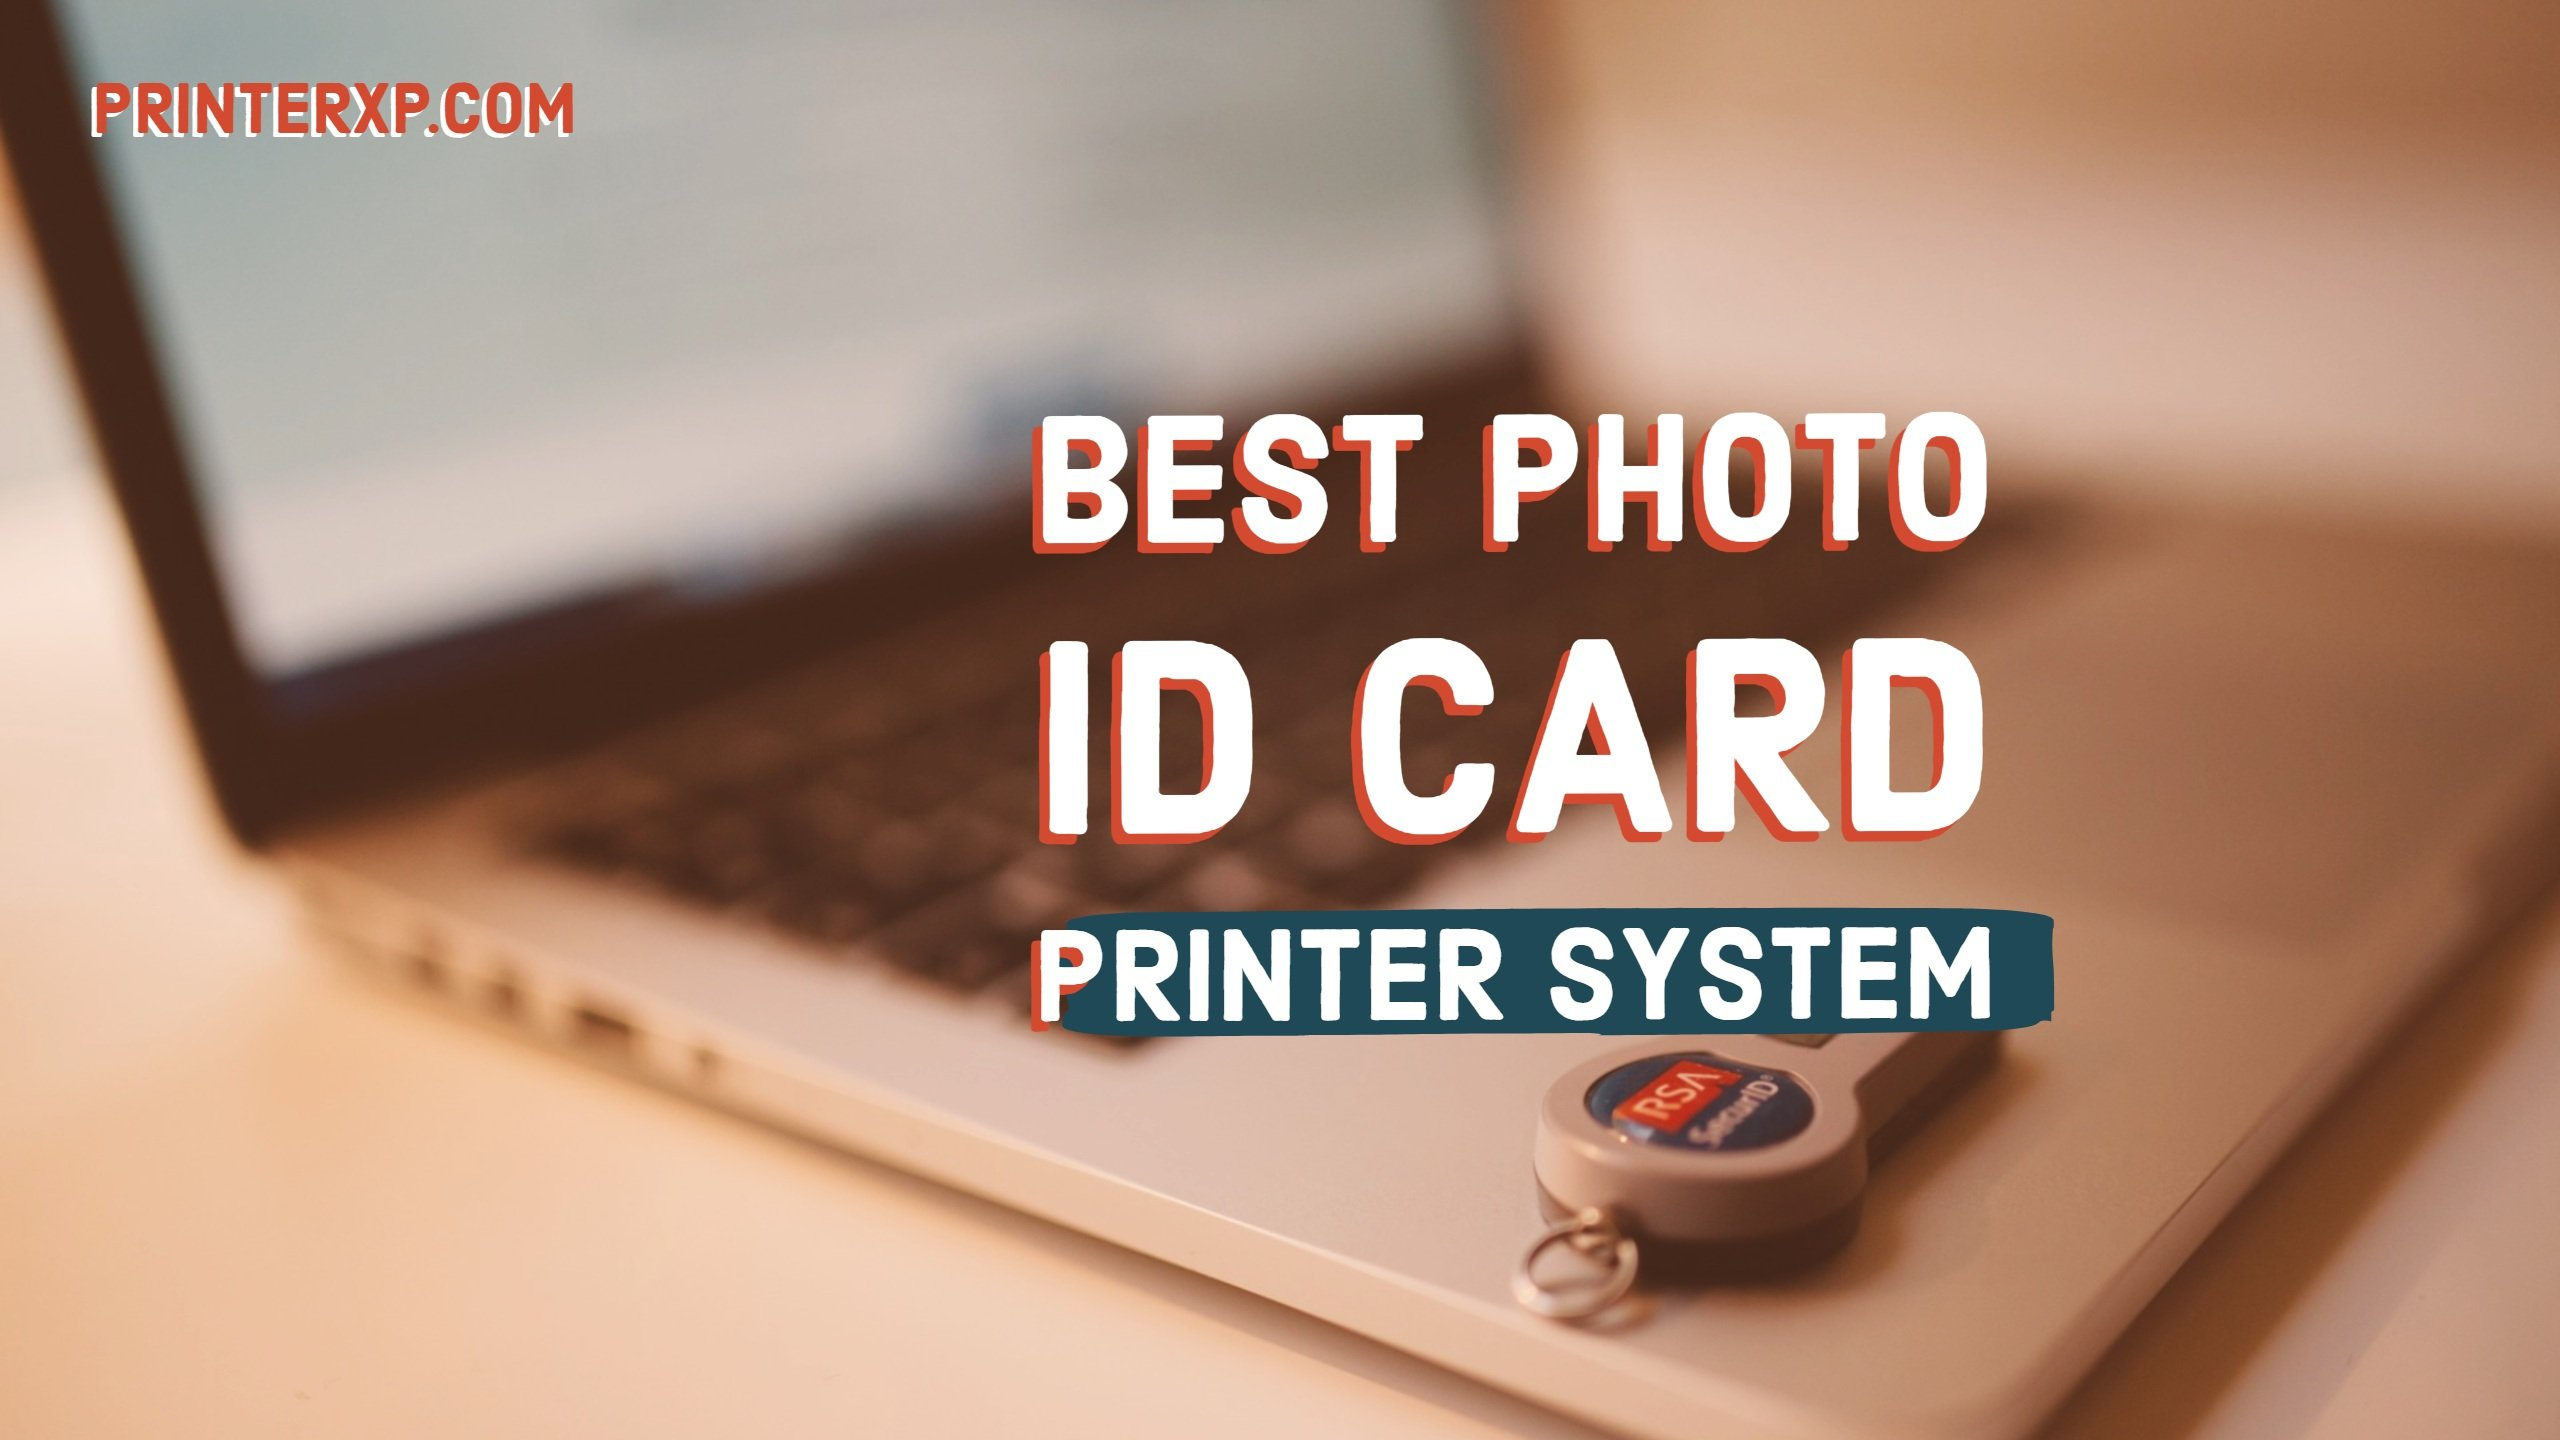 Best Photo ID Card Printer System